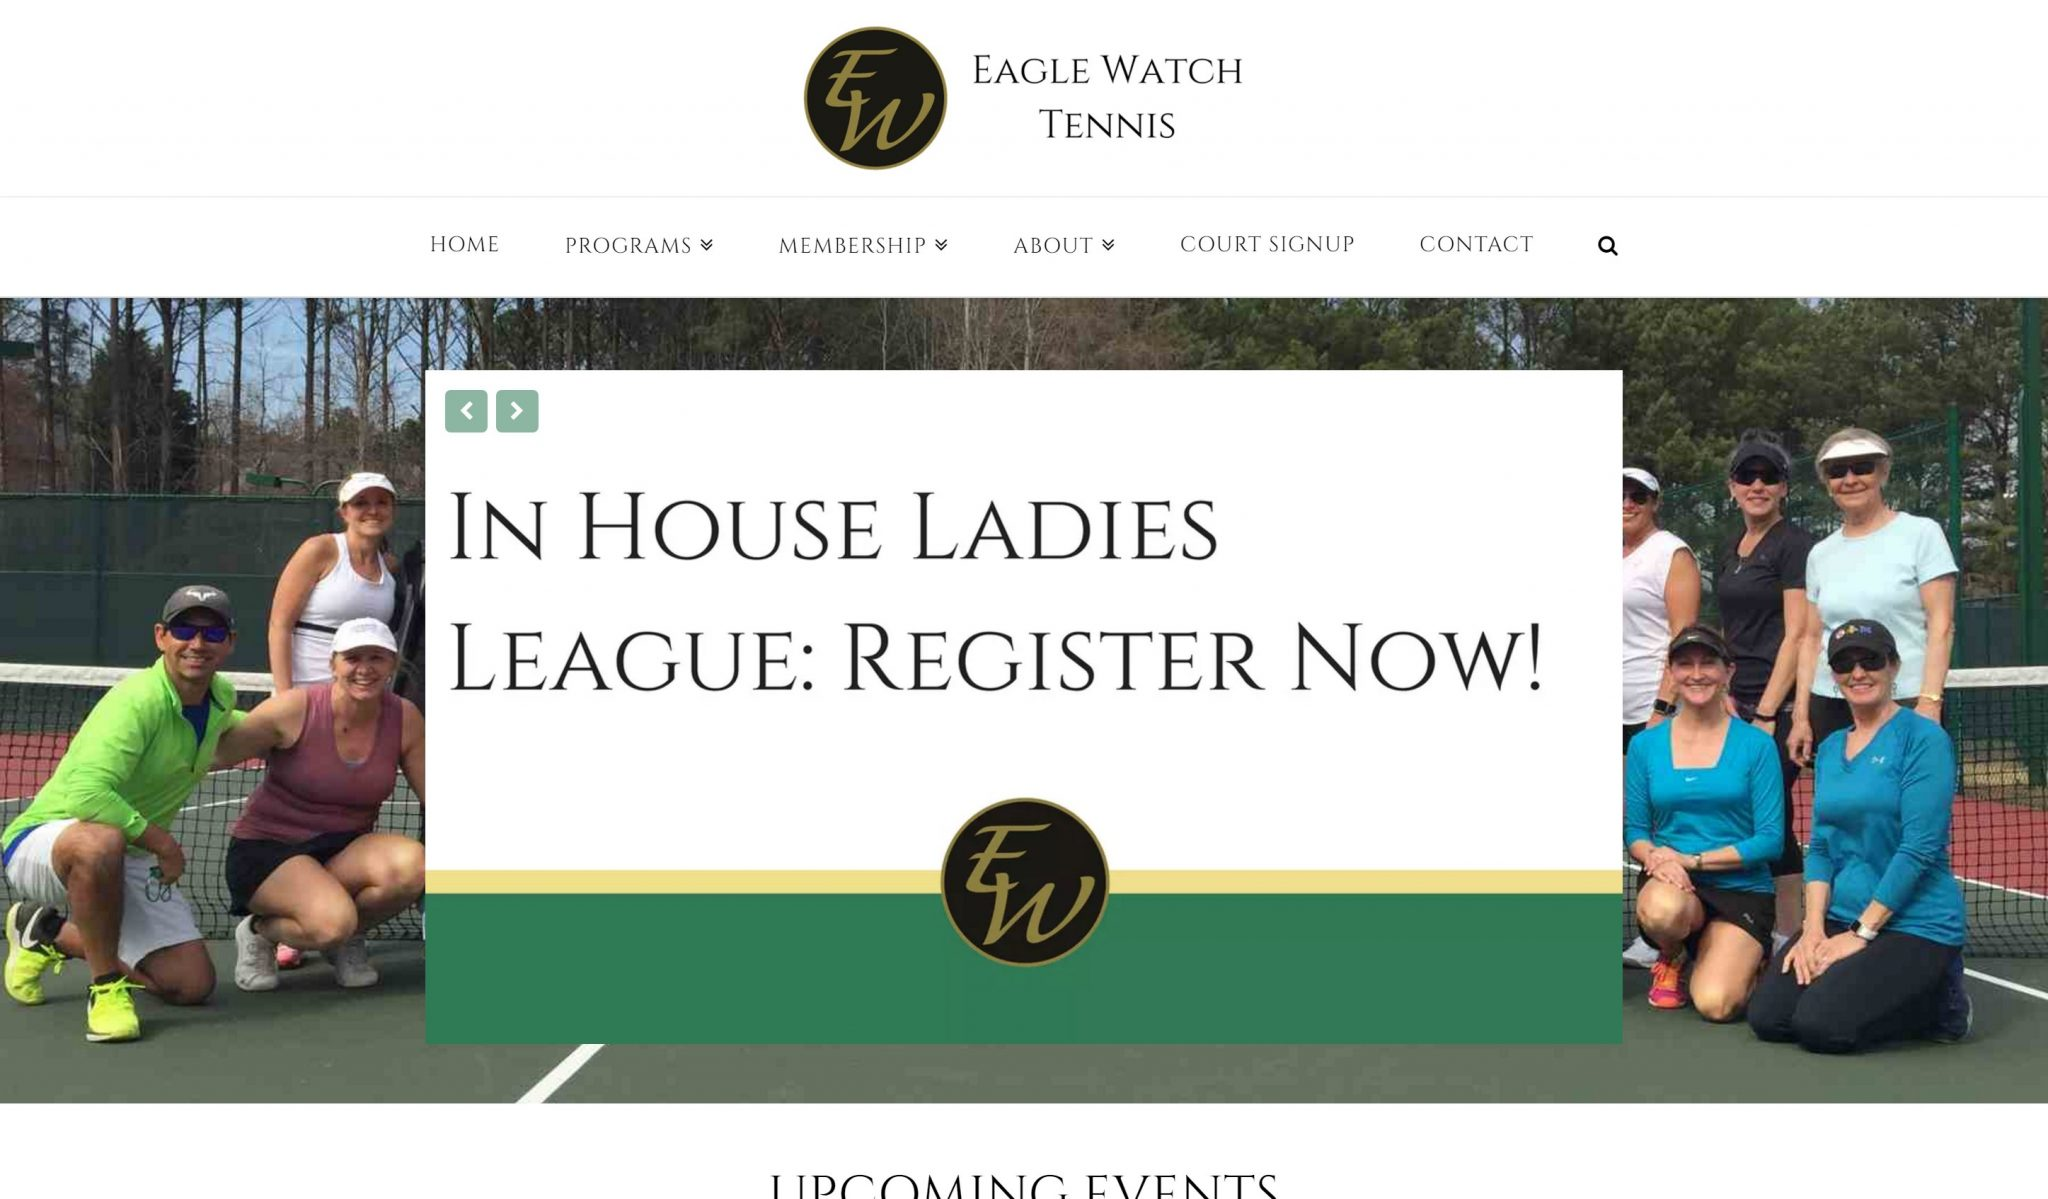 Eagle Watch Tennis Website